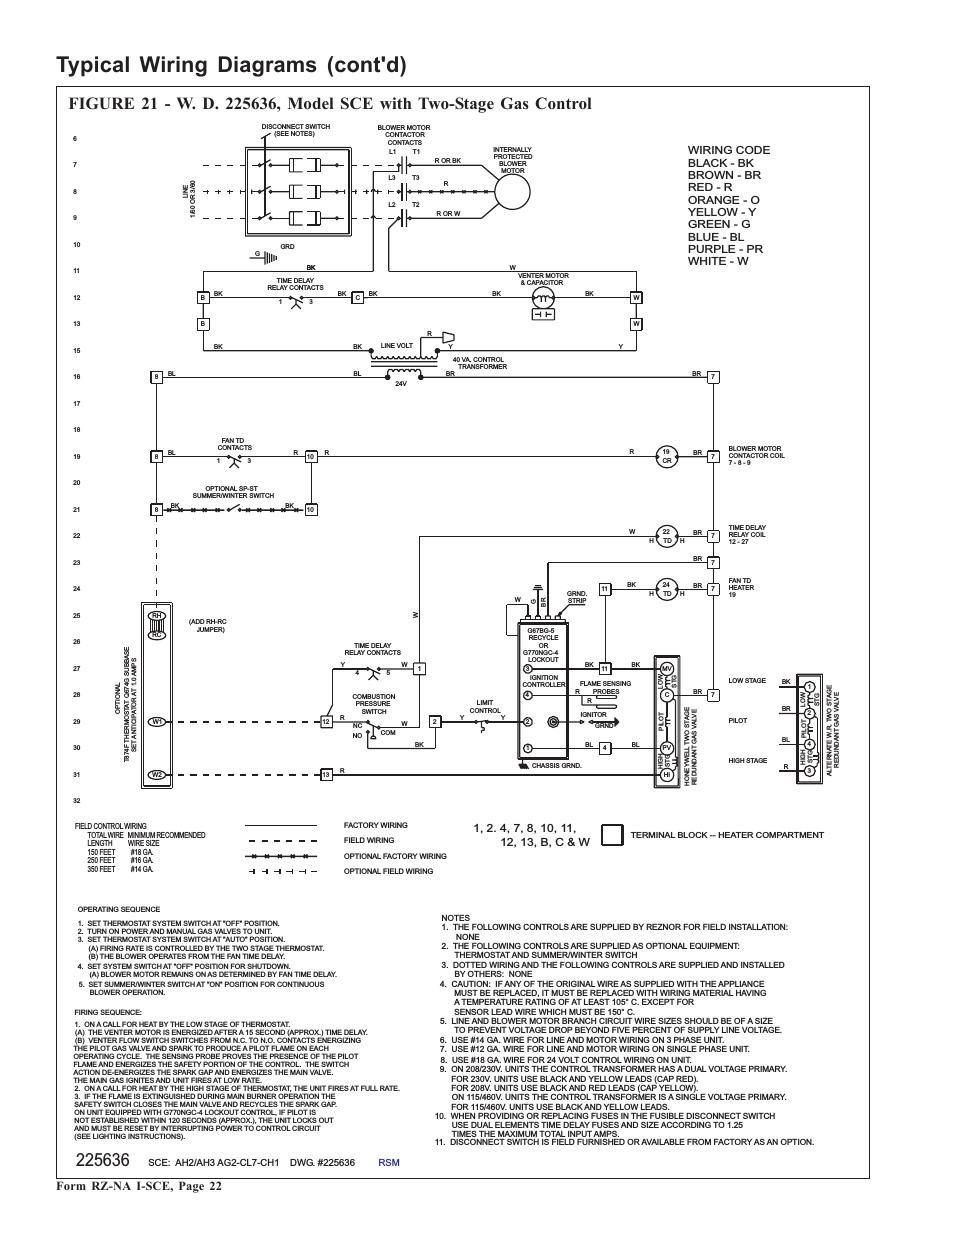 Reznor Heater Wiring Diagram - Wiring Diagram Blog - Reznor Heater Wiring Diagram